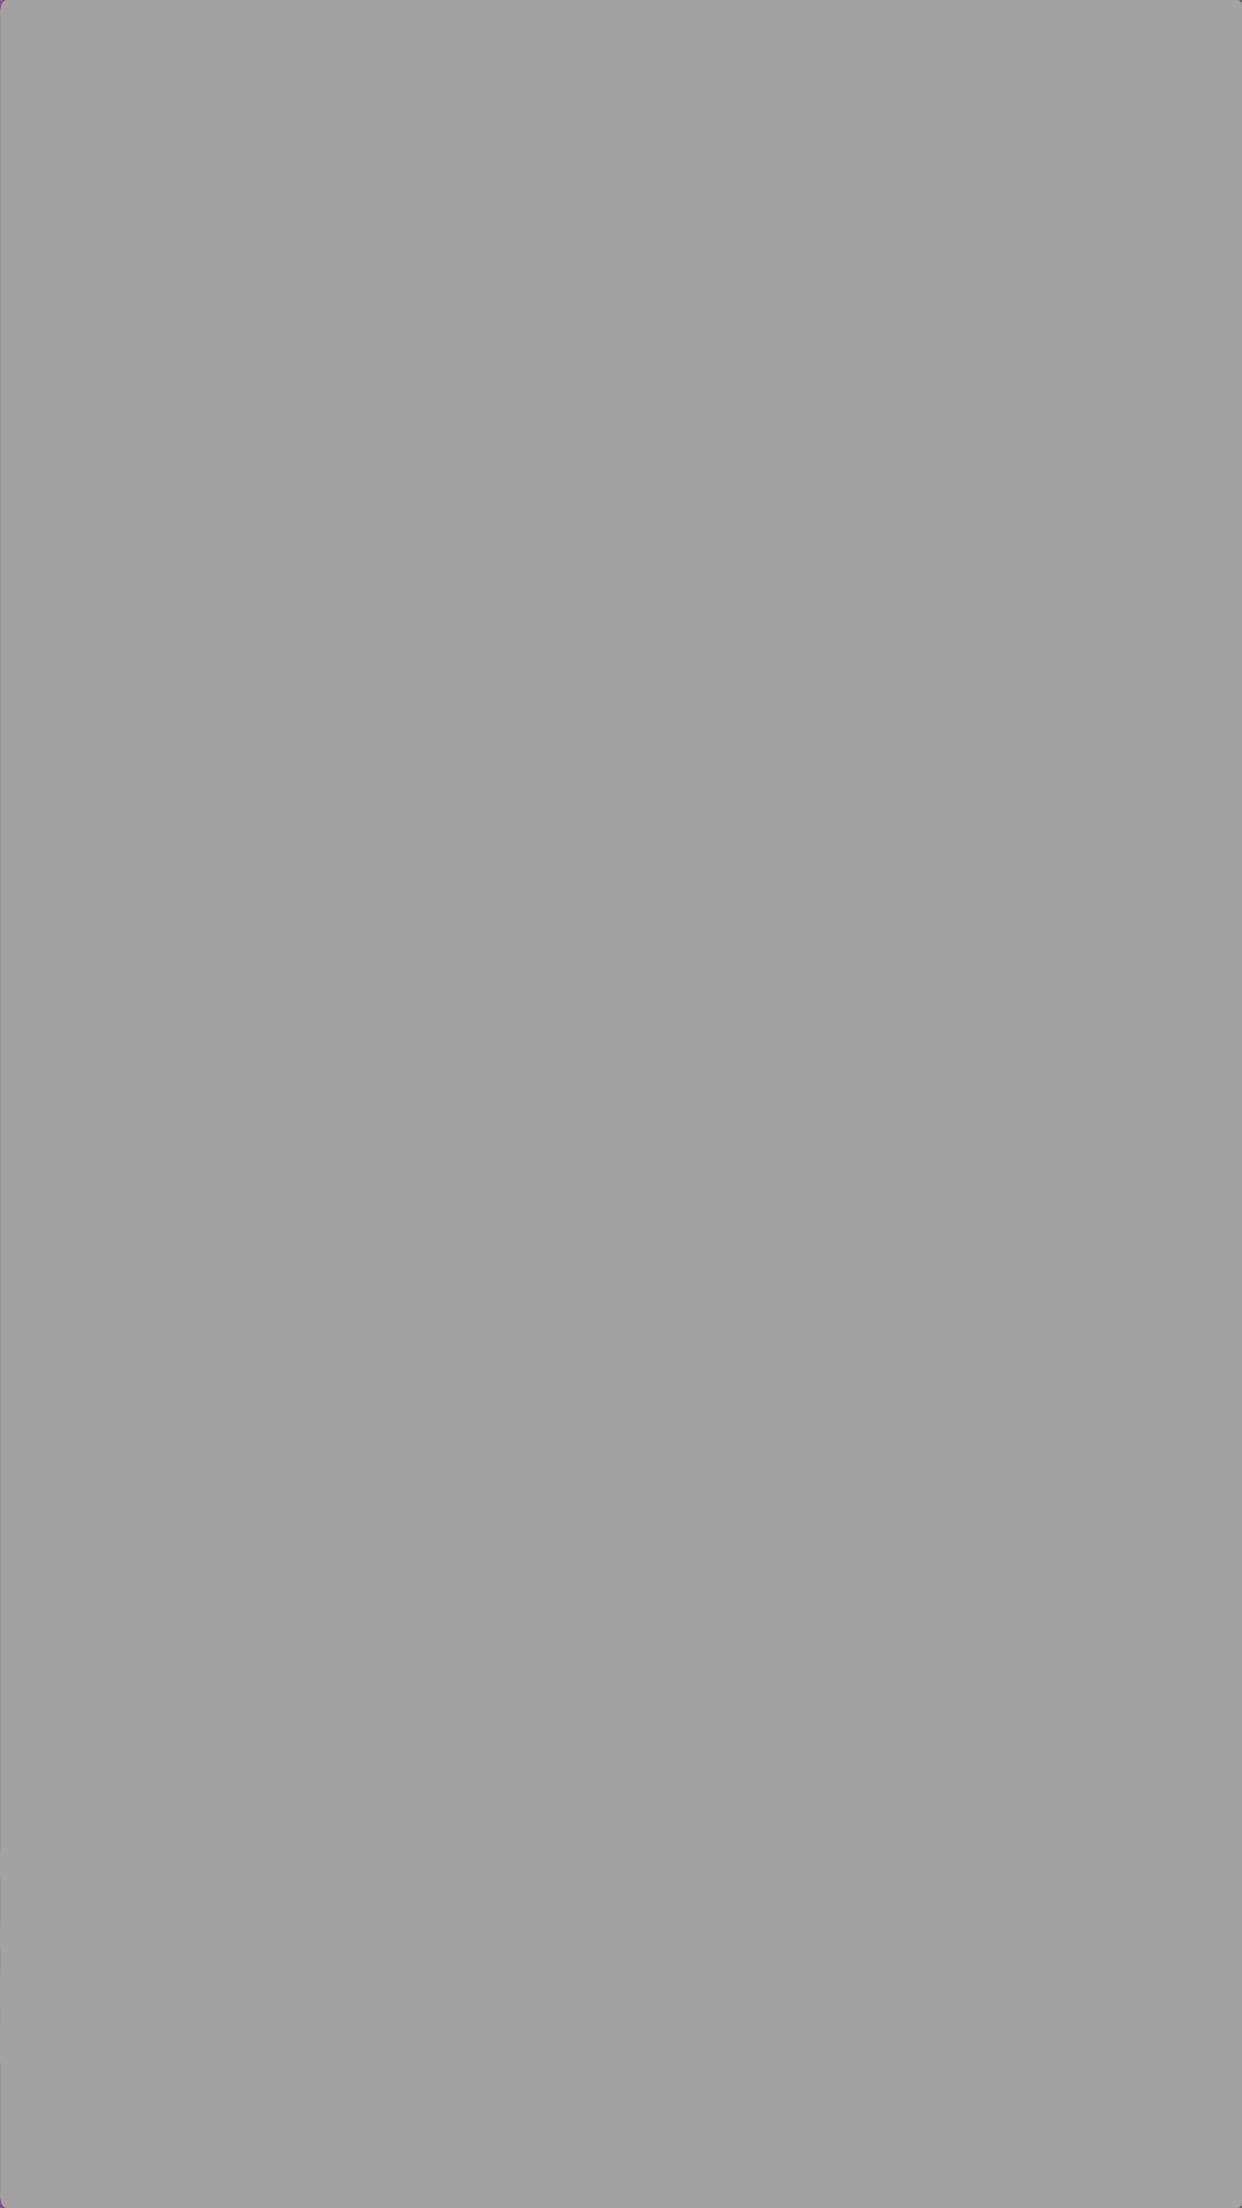 Dark Grey Iphone 5 6 Wallpaper Ipod Wallpaper Shirt 1080x1920 Download Hd Wallpaper Wallpapertip